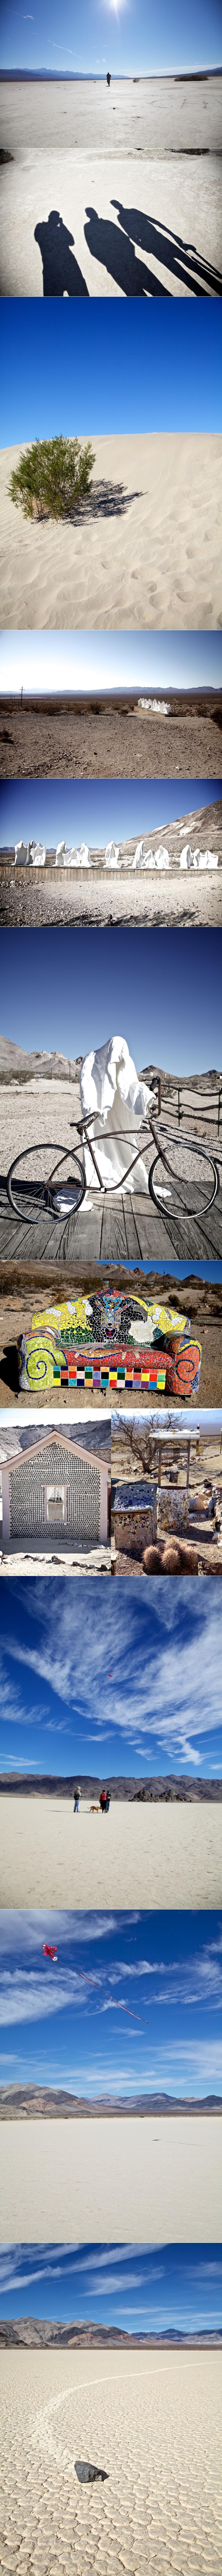 Death Valley collage